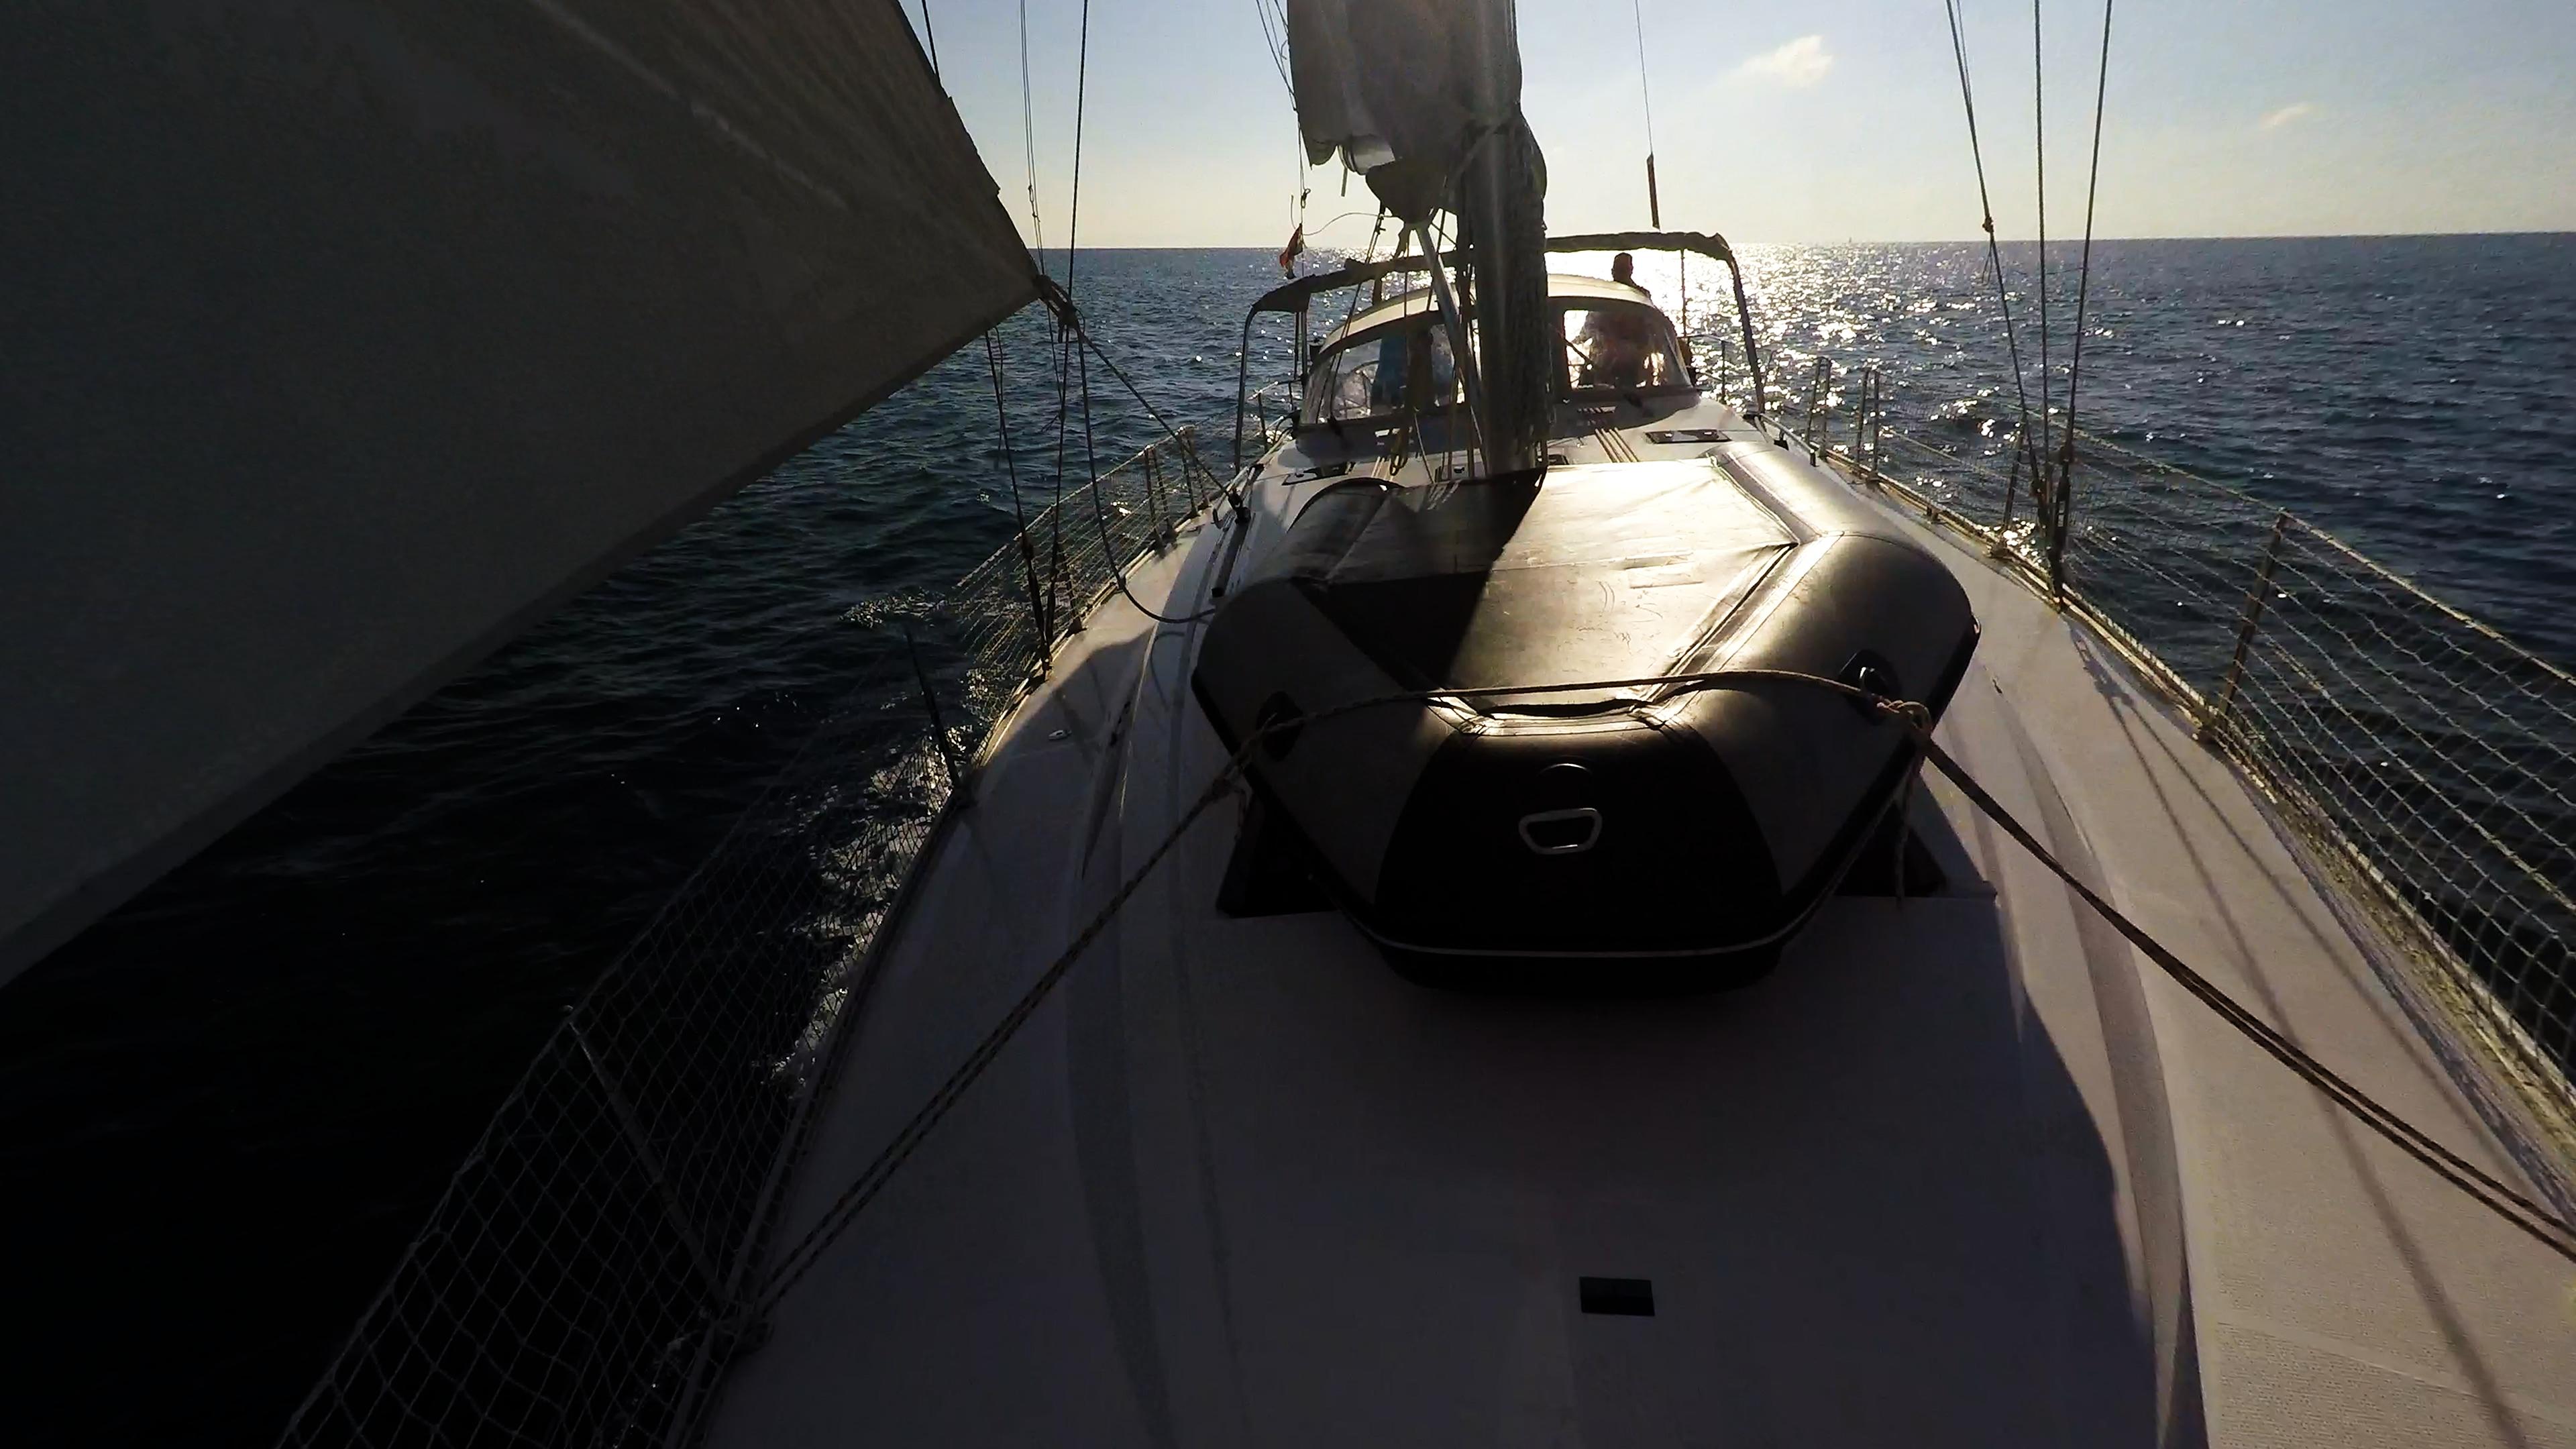 barcha a vela gommone al pontedi yacht a vela bavaria 46 rete di sicurezza vele